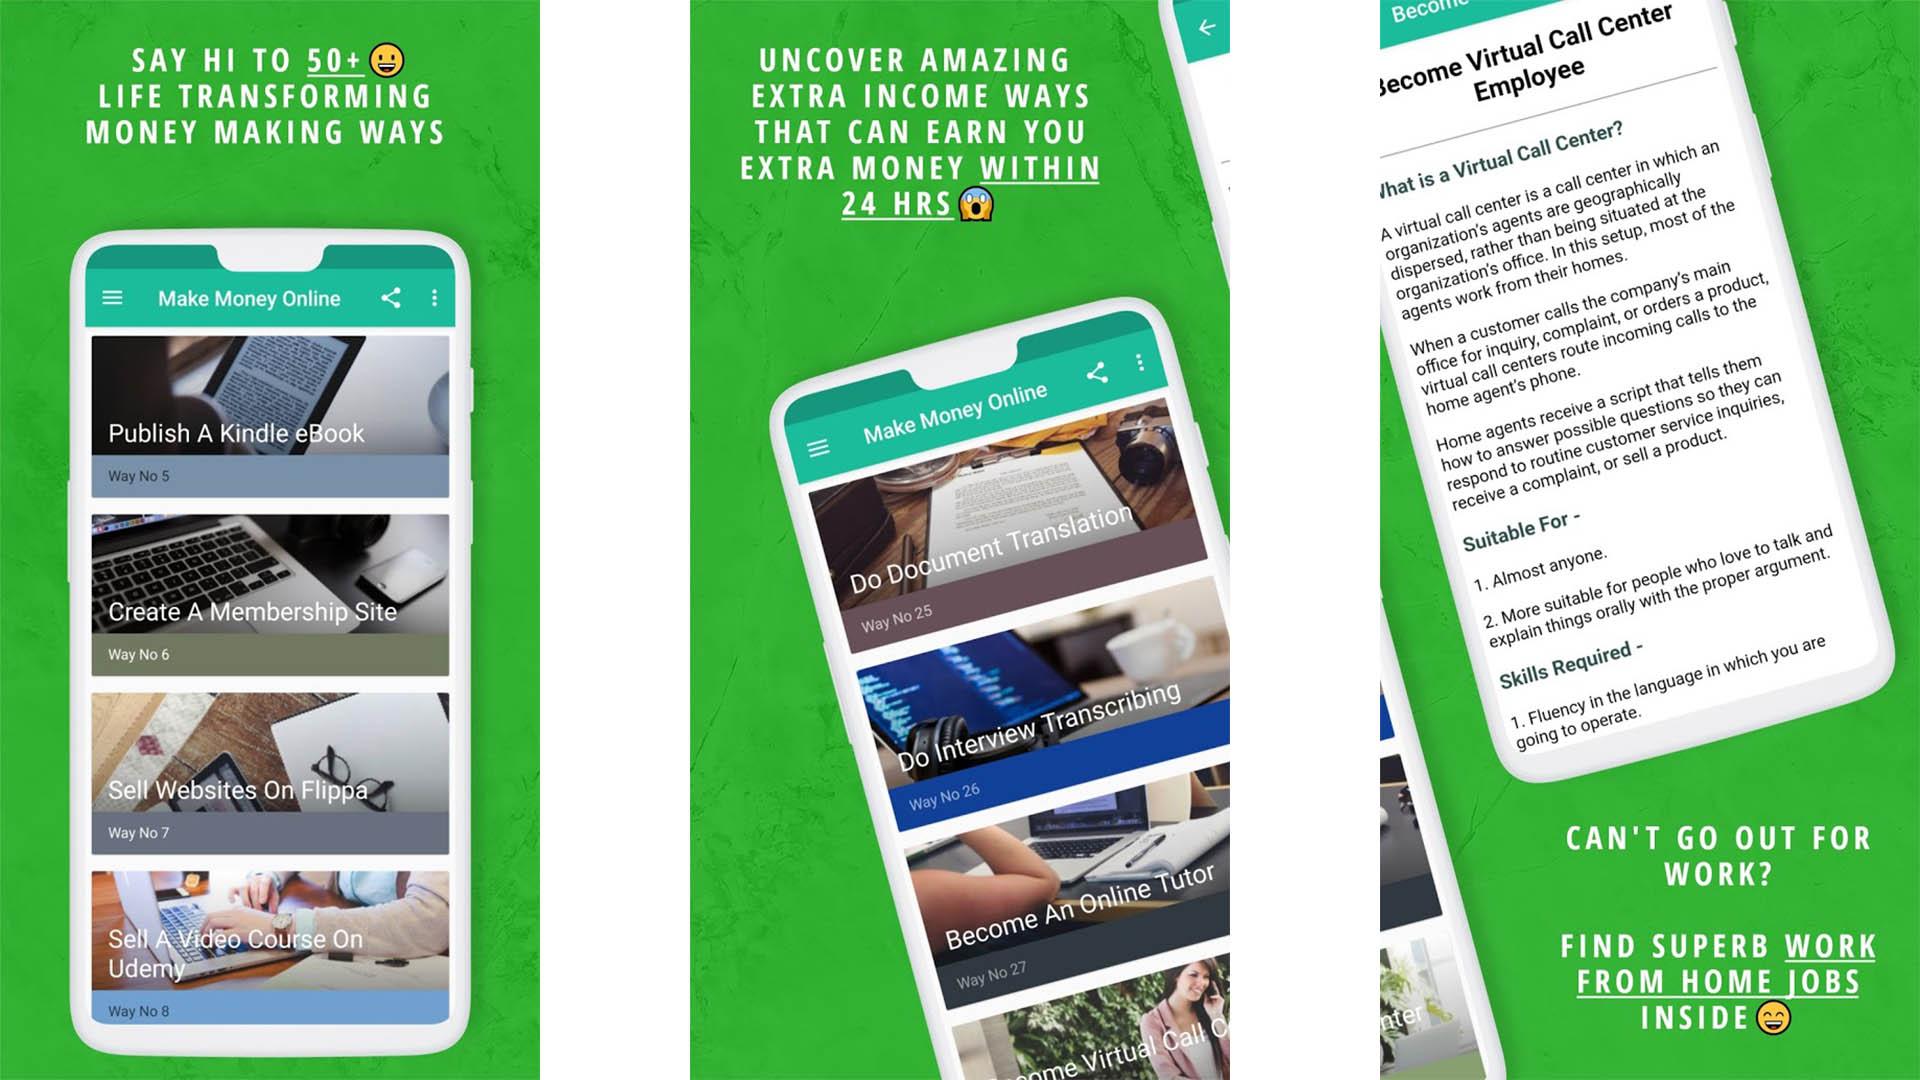 Make Money Passive Income Ideas screenshot 2021